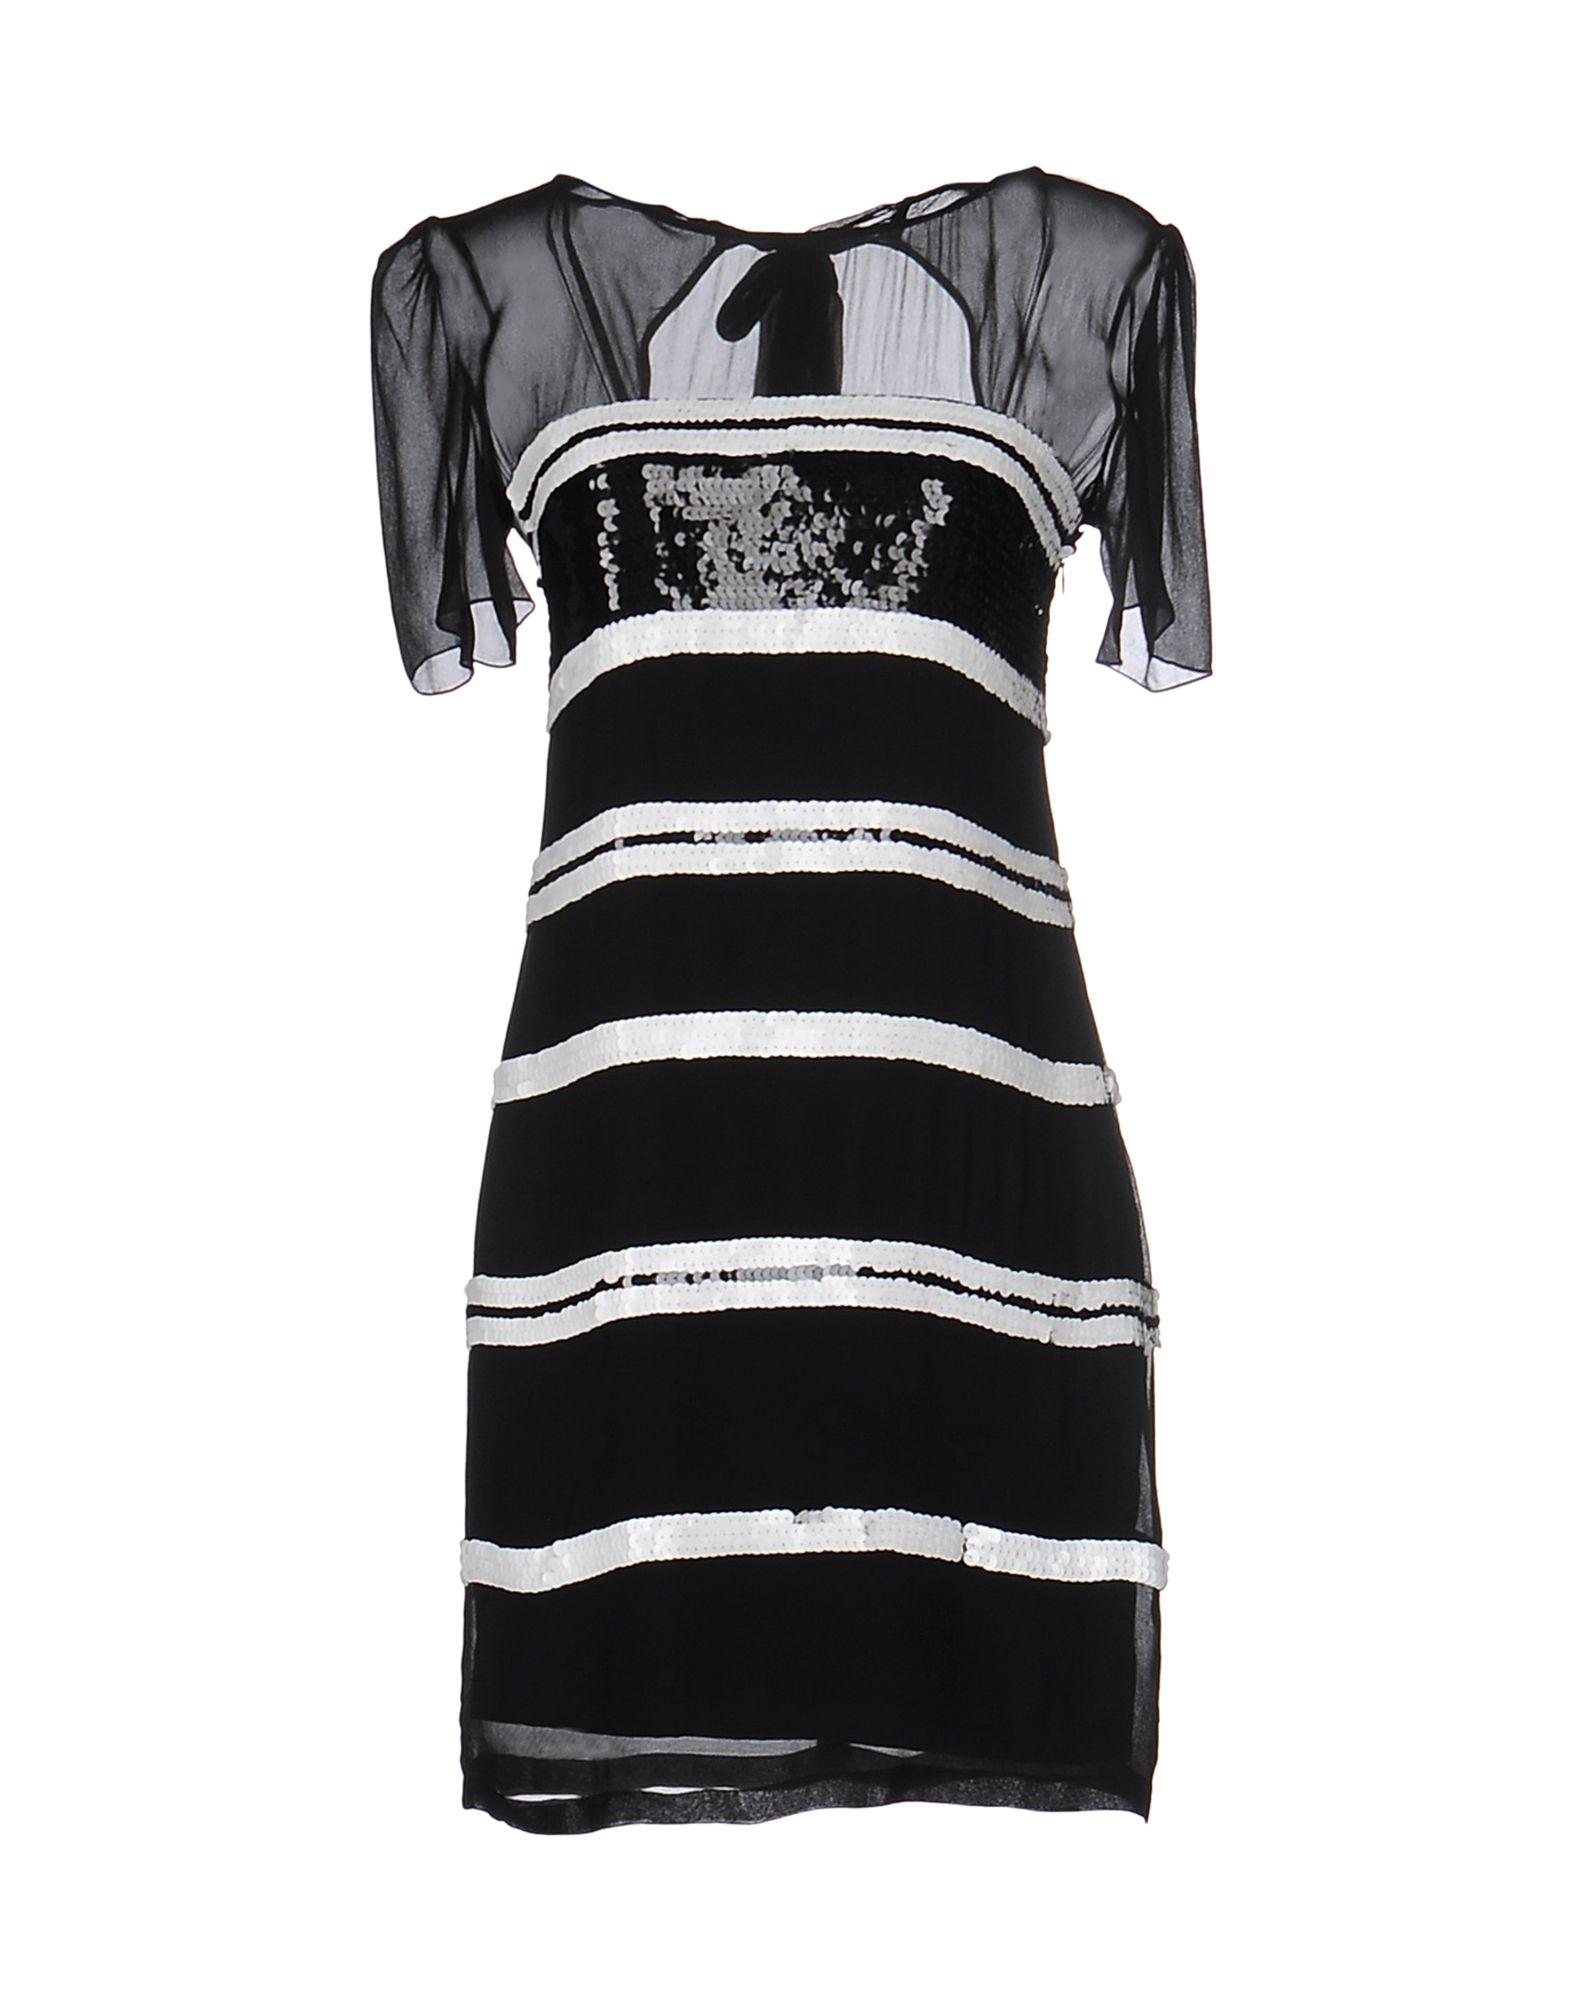 ALICE by TEMPERLEY Короткое платье платье alice by temperley платья и сарафаны макси длинные